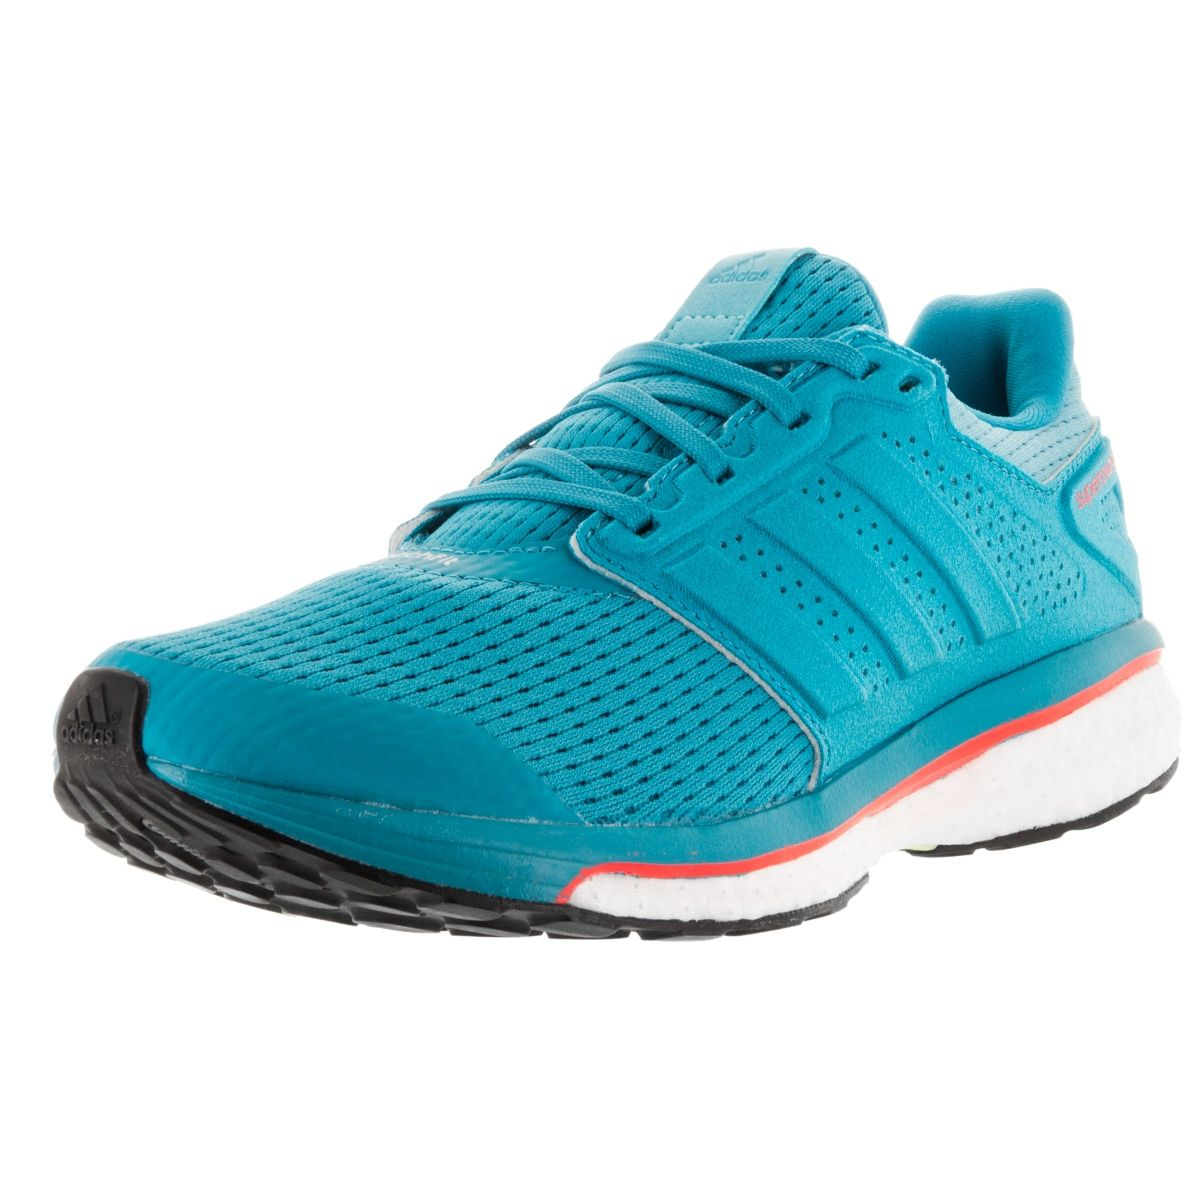 Adidas Women\u0027s Supernova Glide Craft Blue Running Shoe by Adidas